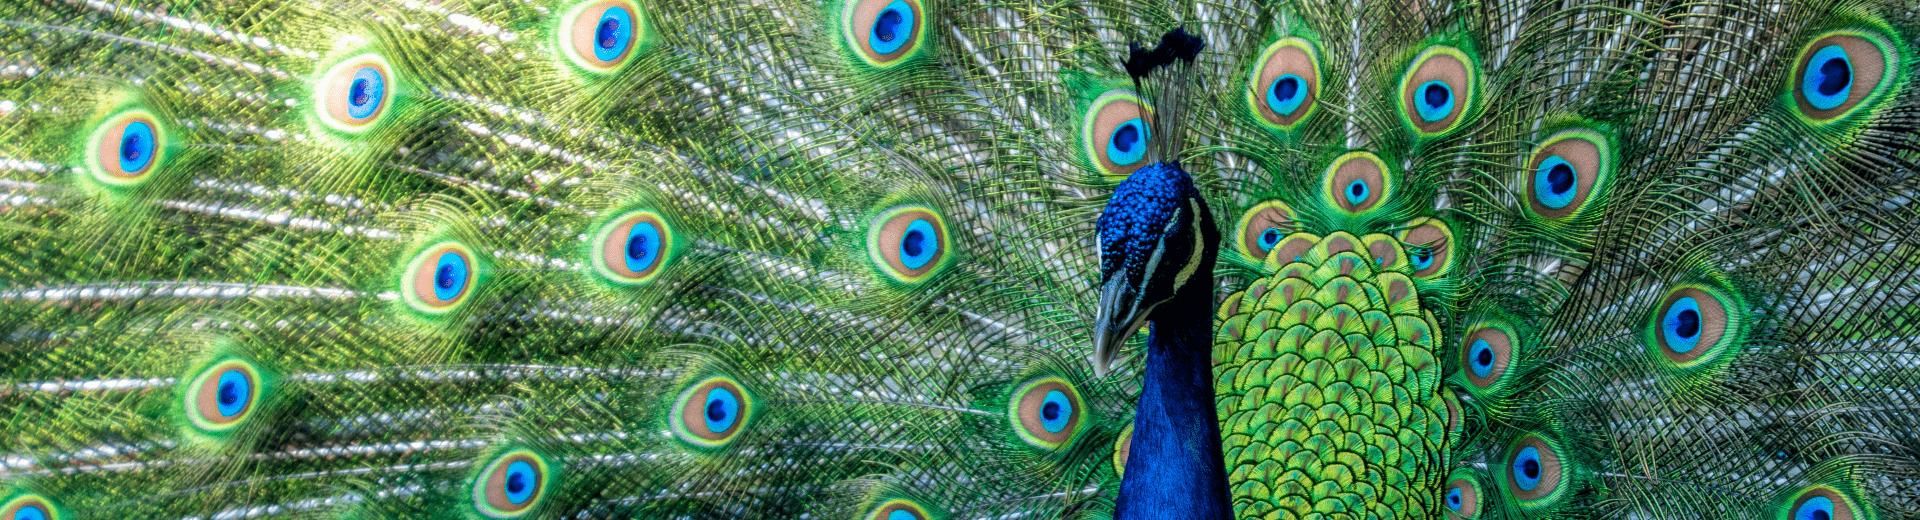 banner peacock